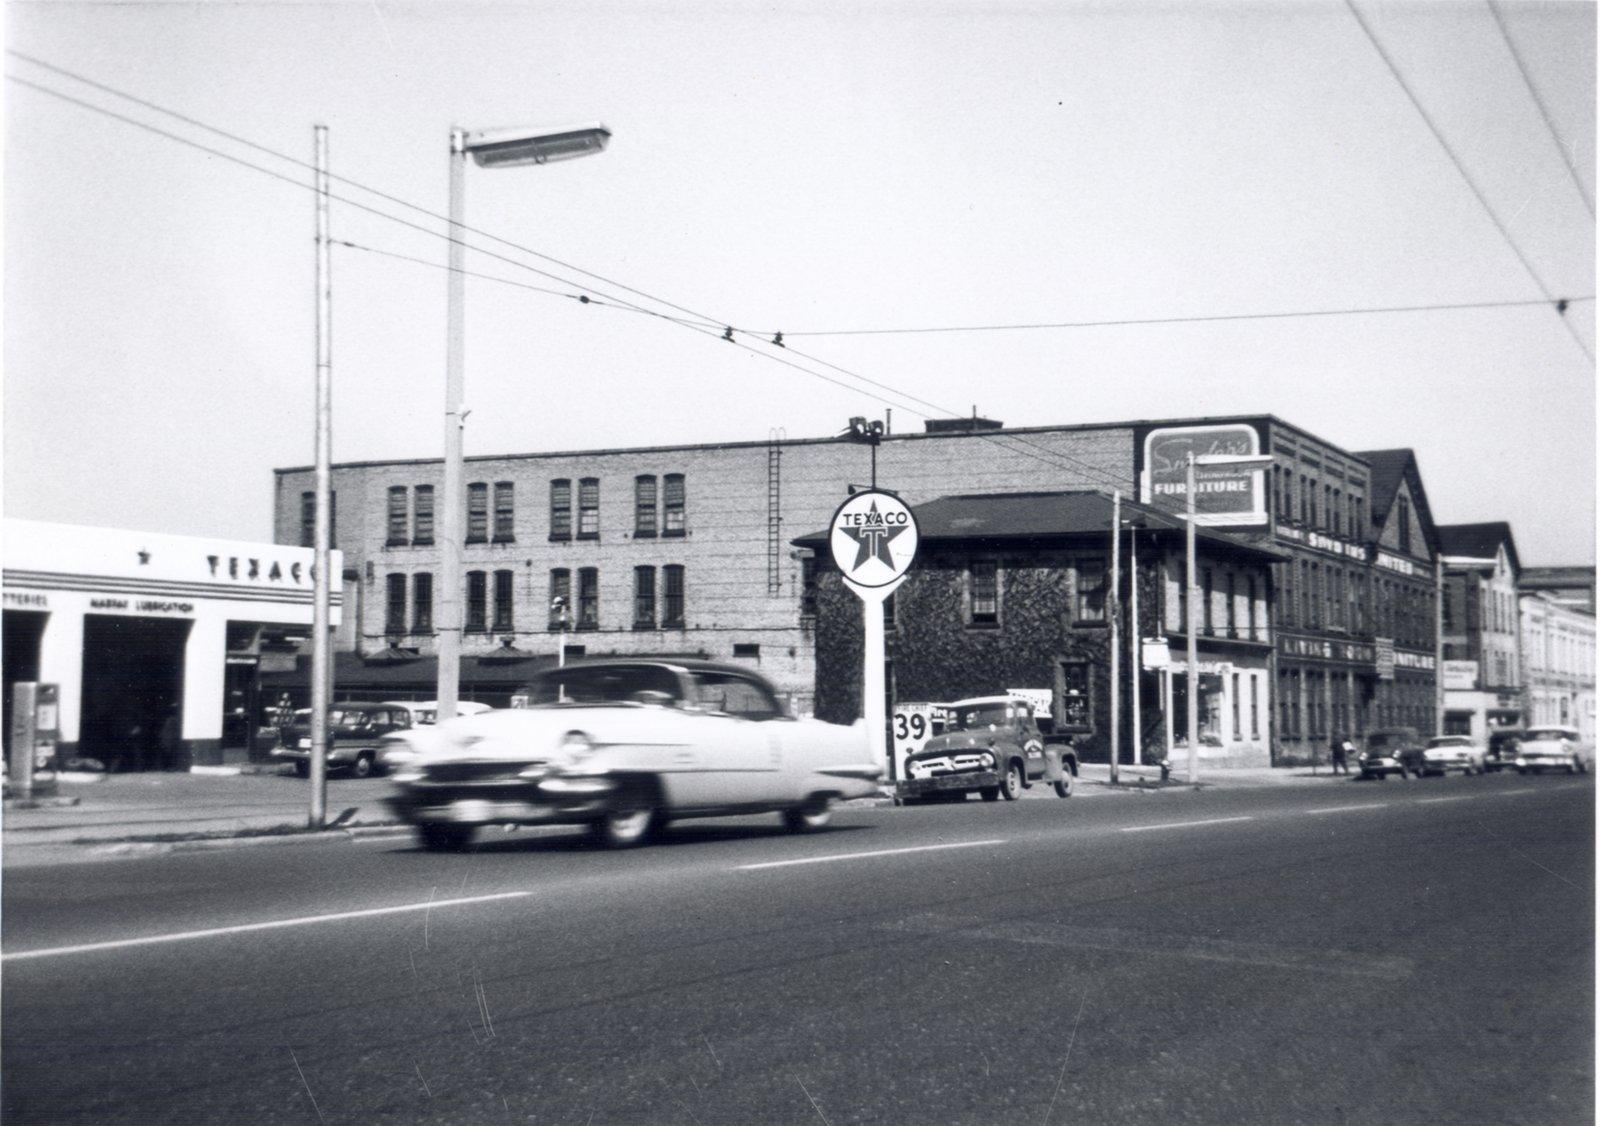 Texaco Station, Waterloo, Ontario: Waterloo Public Library Digital ...